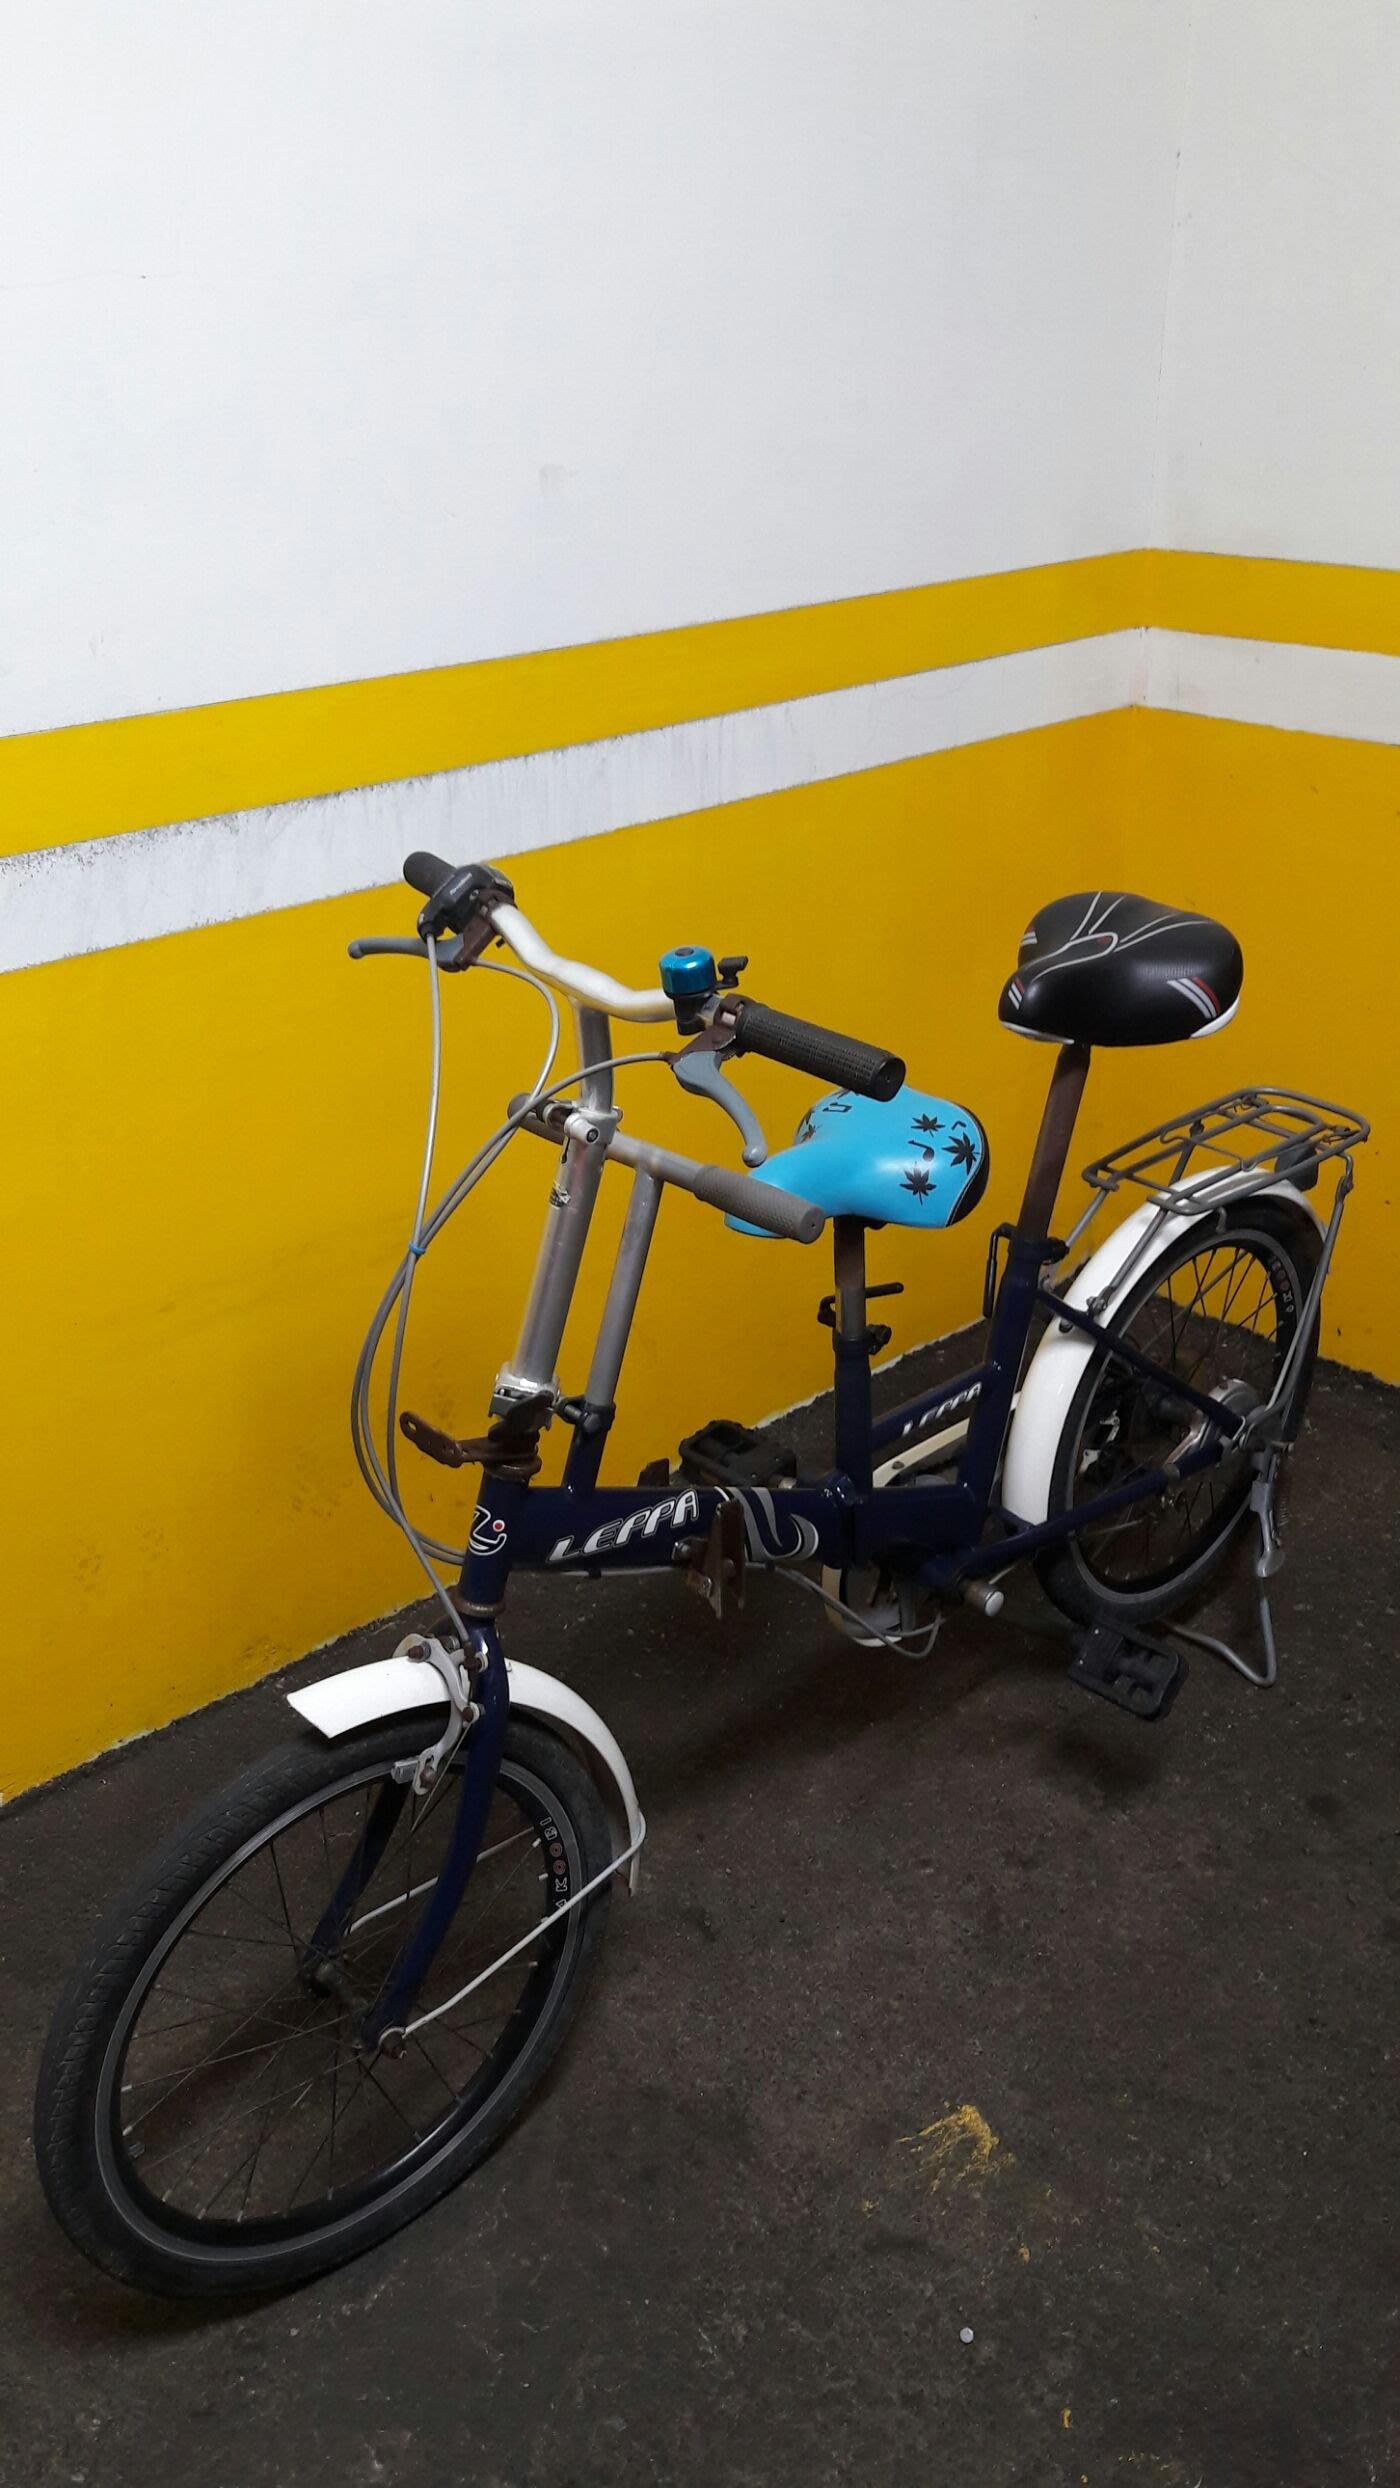 leppa深藍色20吋6段shimano六段變速摺疊親子腳踏車